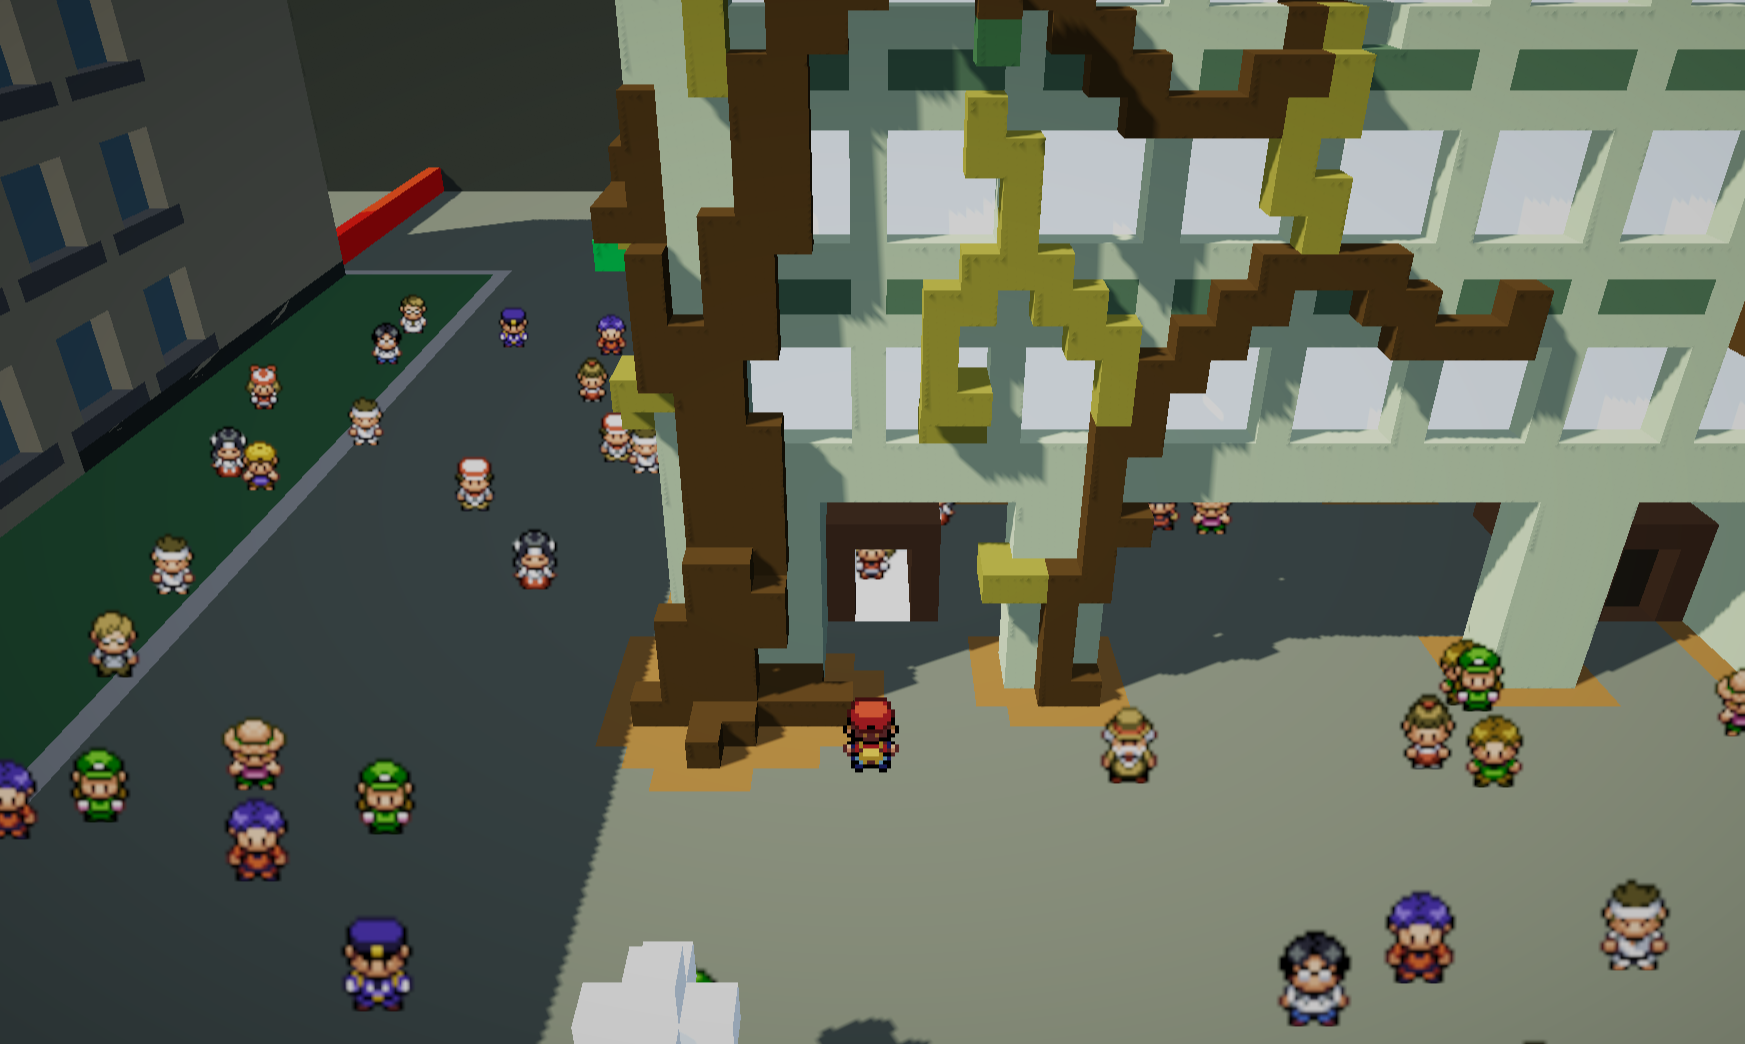 screenshot, green building in pokemon-like demo